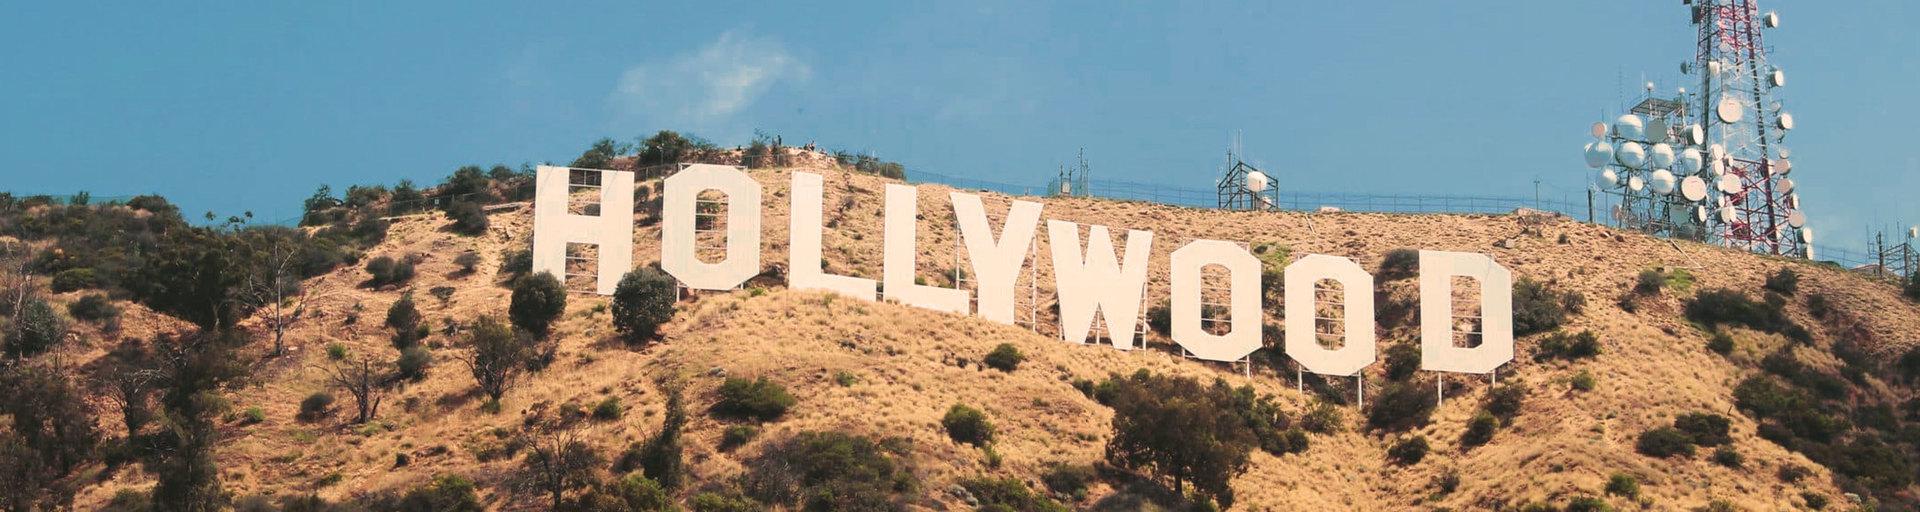 Однажды вГолливуде: полный гид потворчеству Тарантино иАмерике 1960-х